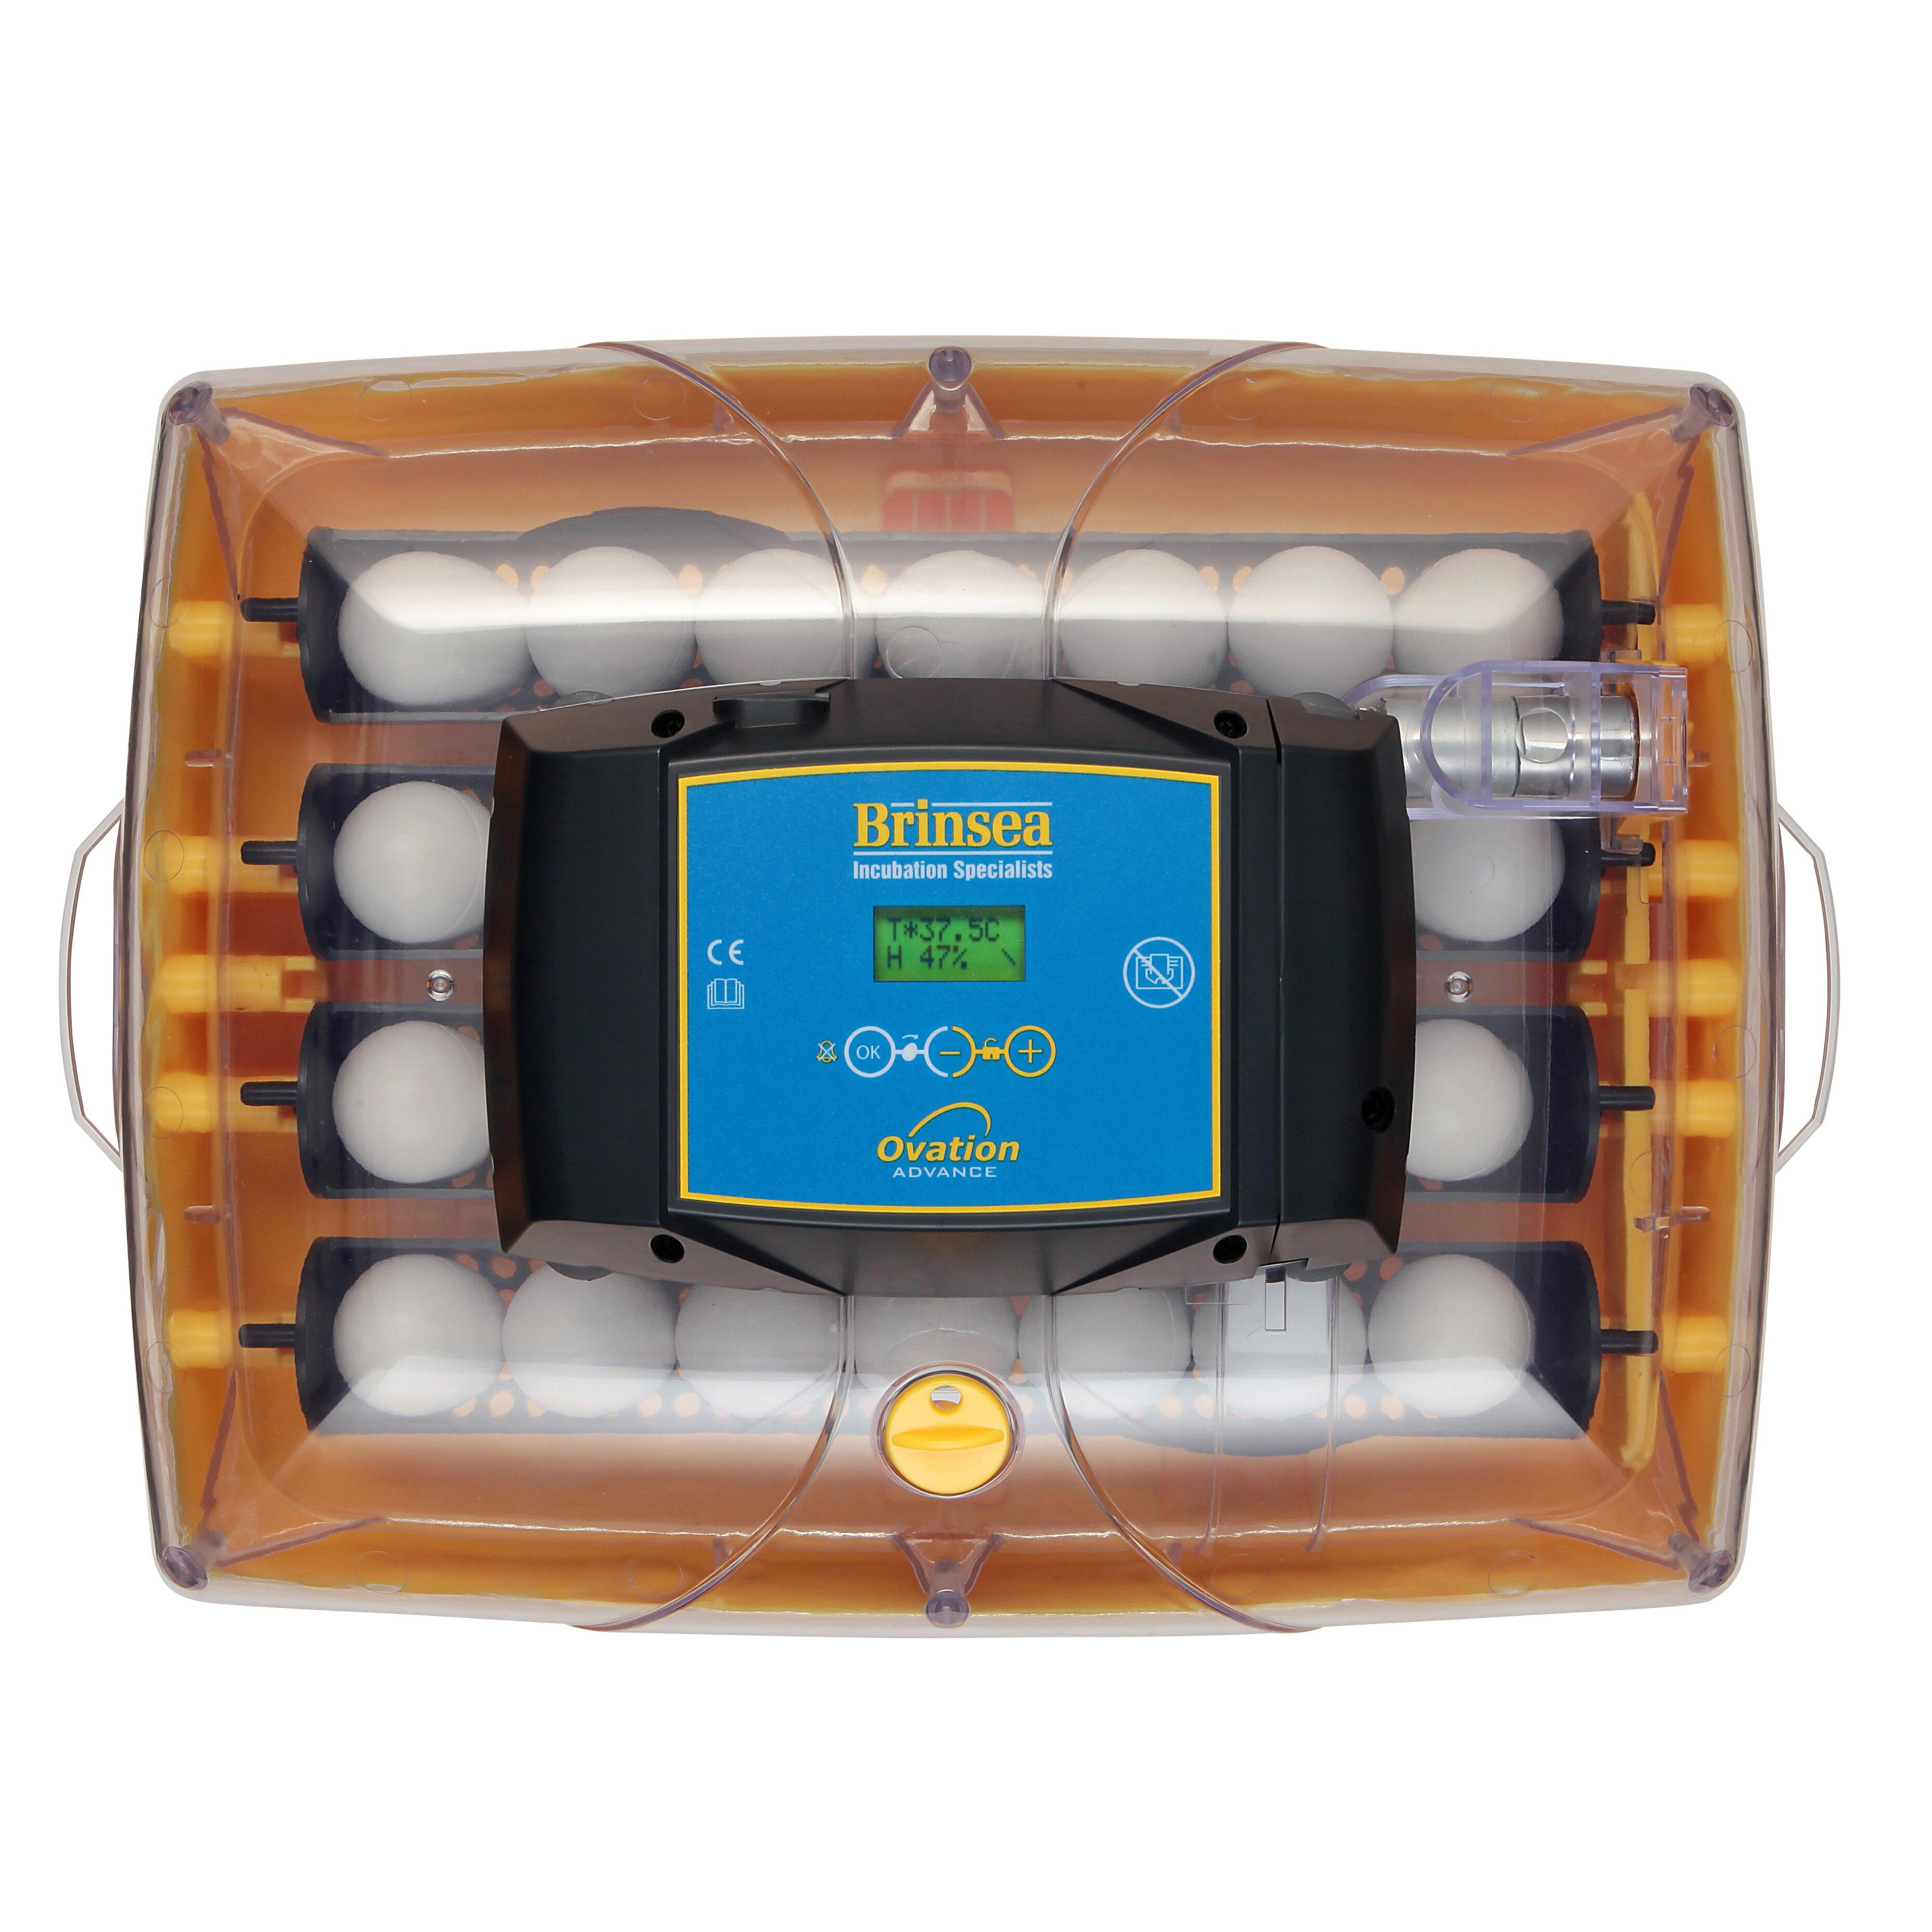 Cabinet Incubator Kit Brinsea Ovation 28 Advance Automatic Egg Incubator Wayfair